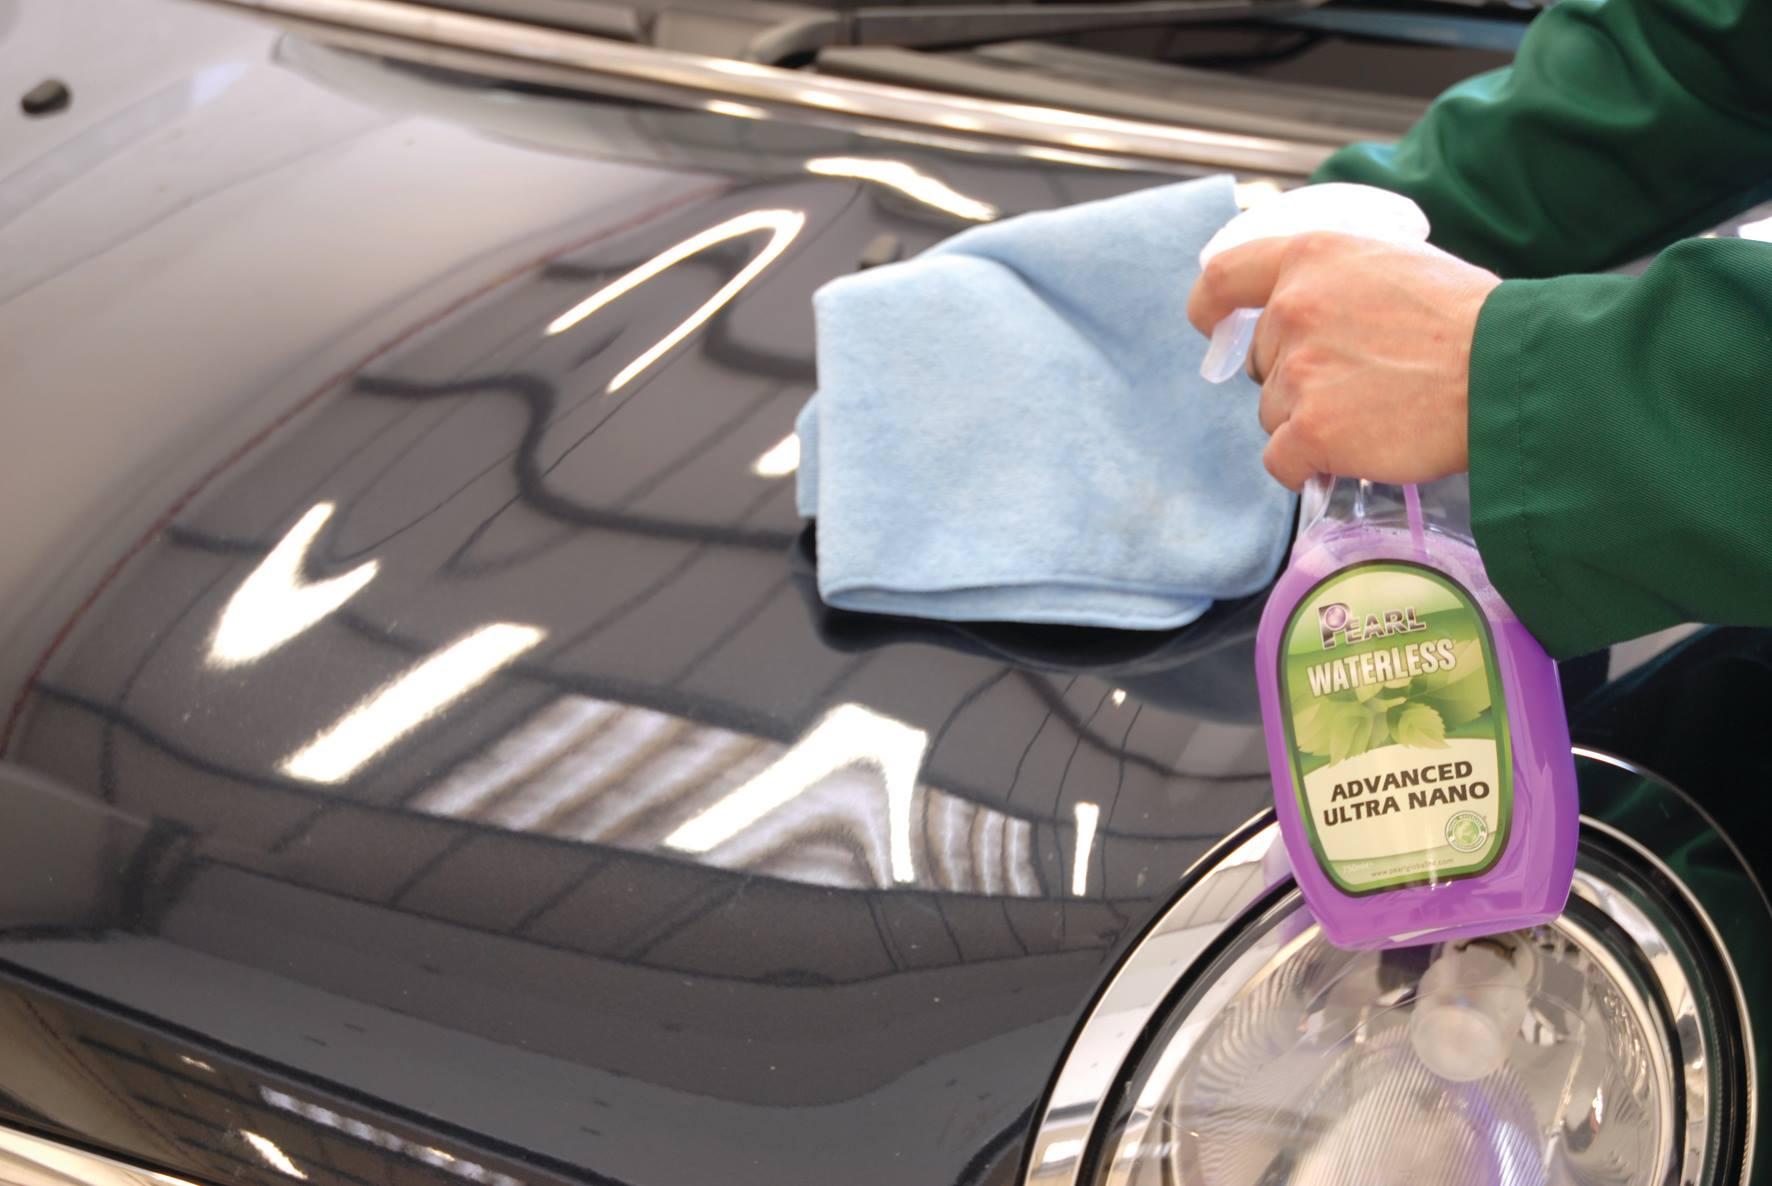 Pearl Advanced Ultra Nano Carnauba Wax Spray Hydrophobic Shine